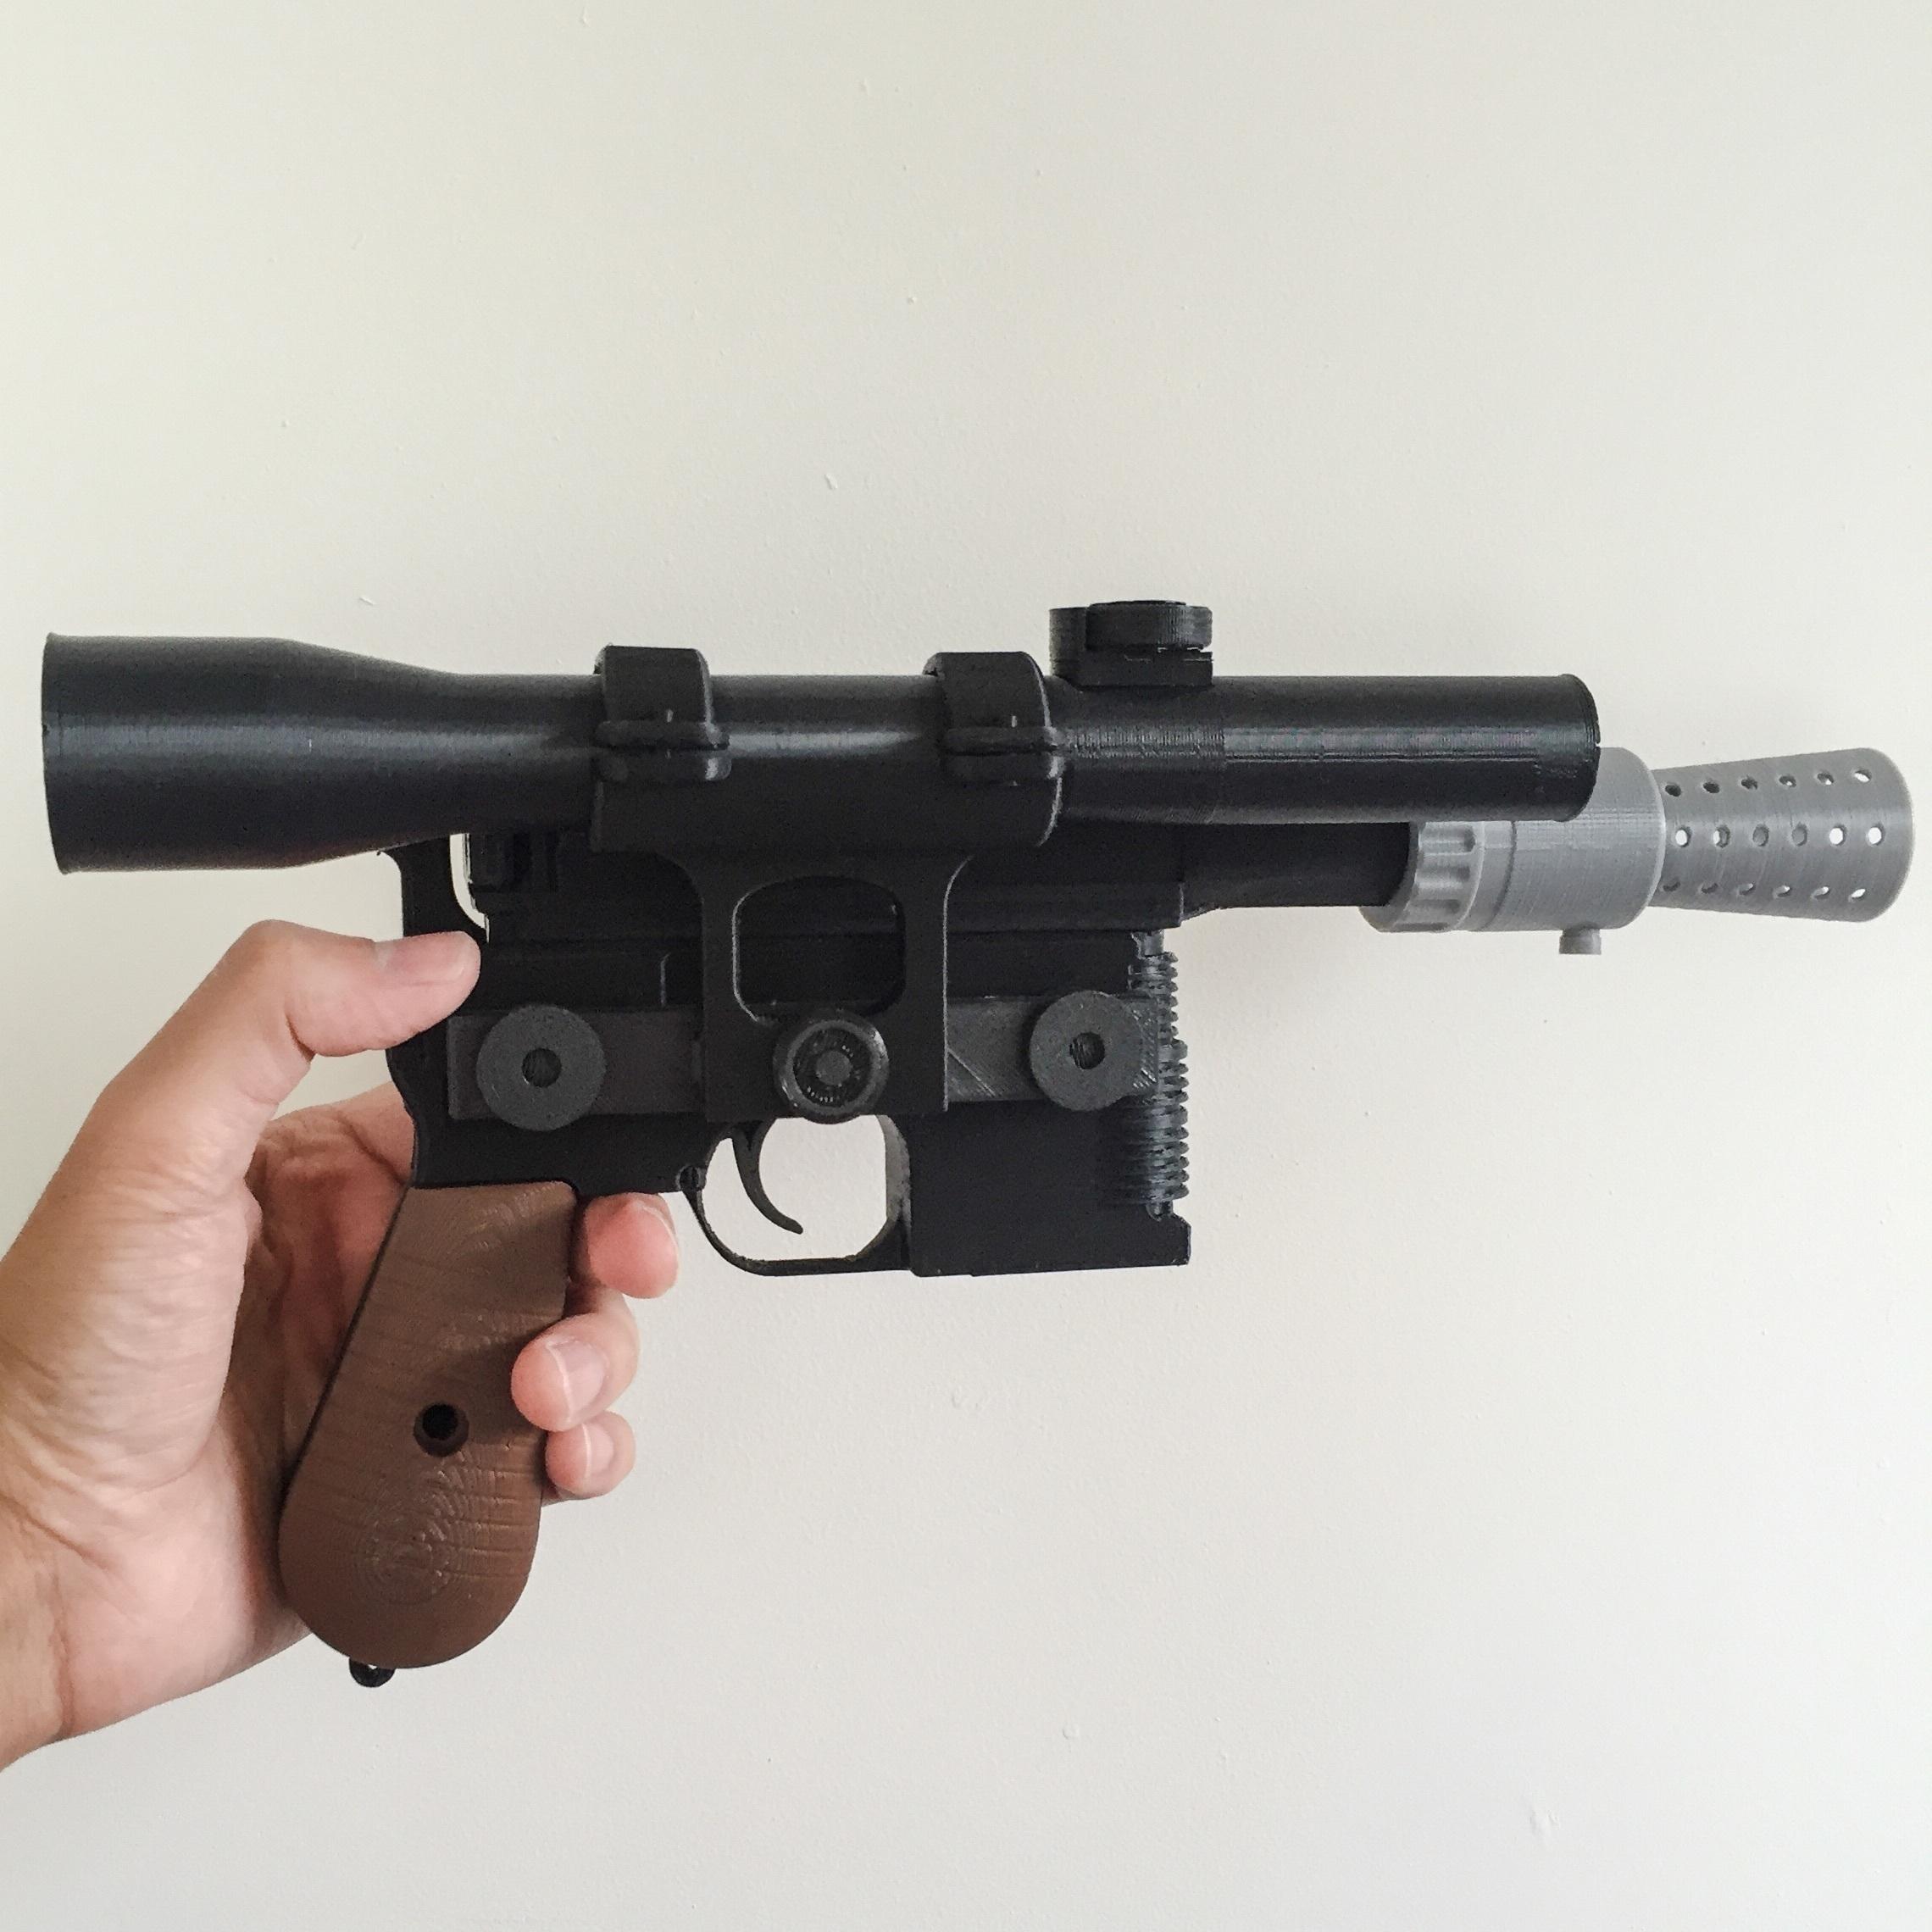 3D Printed Model kit - Han Solo's DL-44 Heavy Blaster Pistol by